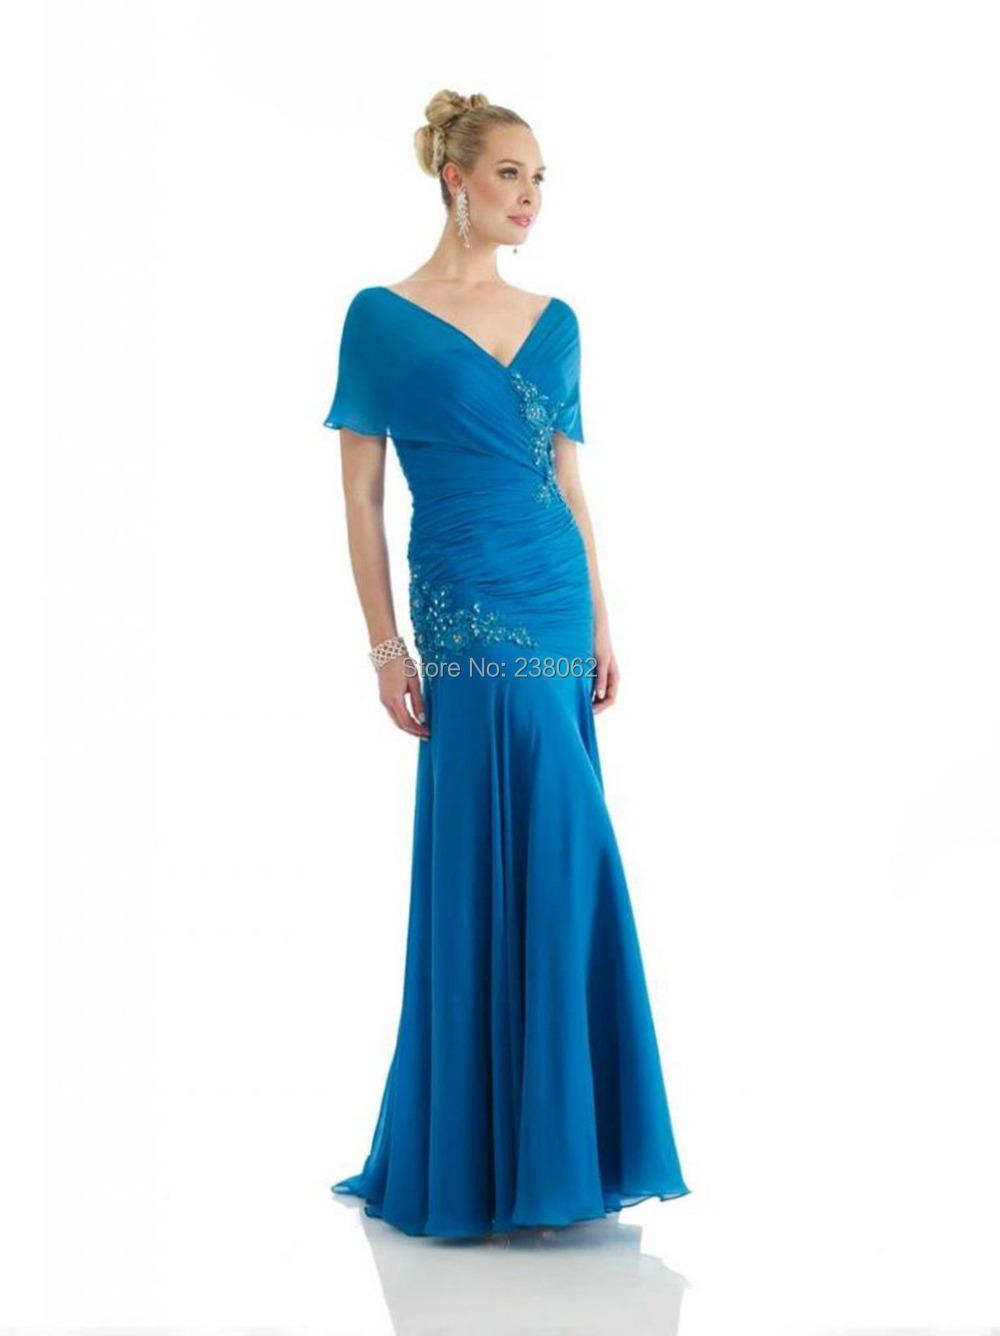 V Neck Mermaid Blue Prom Dresses Open Back Evening Party ...